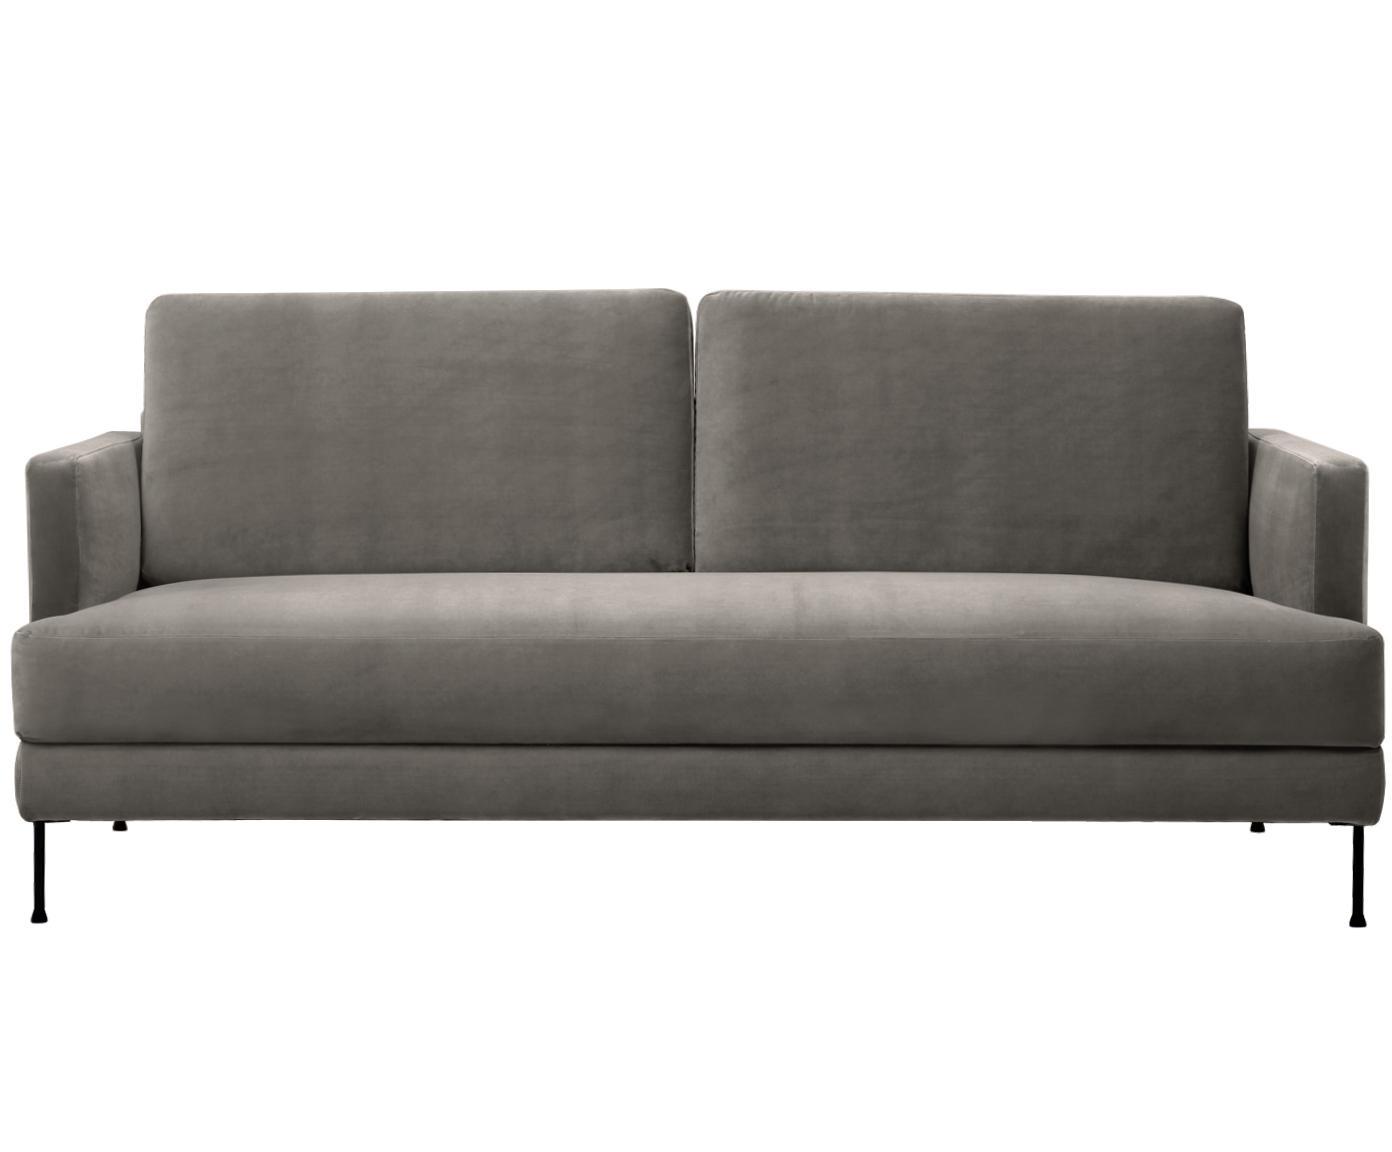 Samt-Sofa Fluente (3-Sitzer), Bezug: Samt (Hochwertiger Polyes, Gestell: Massives Kiefernholz, Samt Braungrau, B 197 x T 83 cm